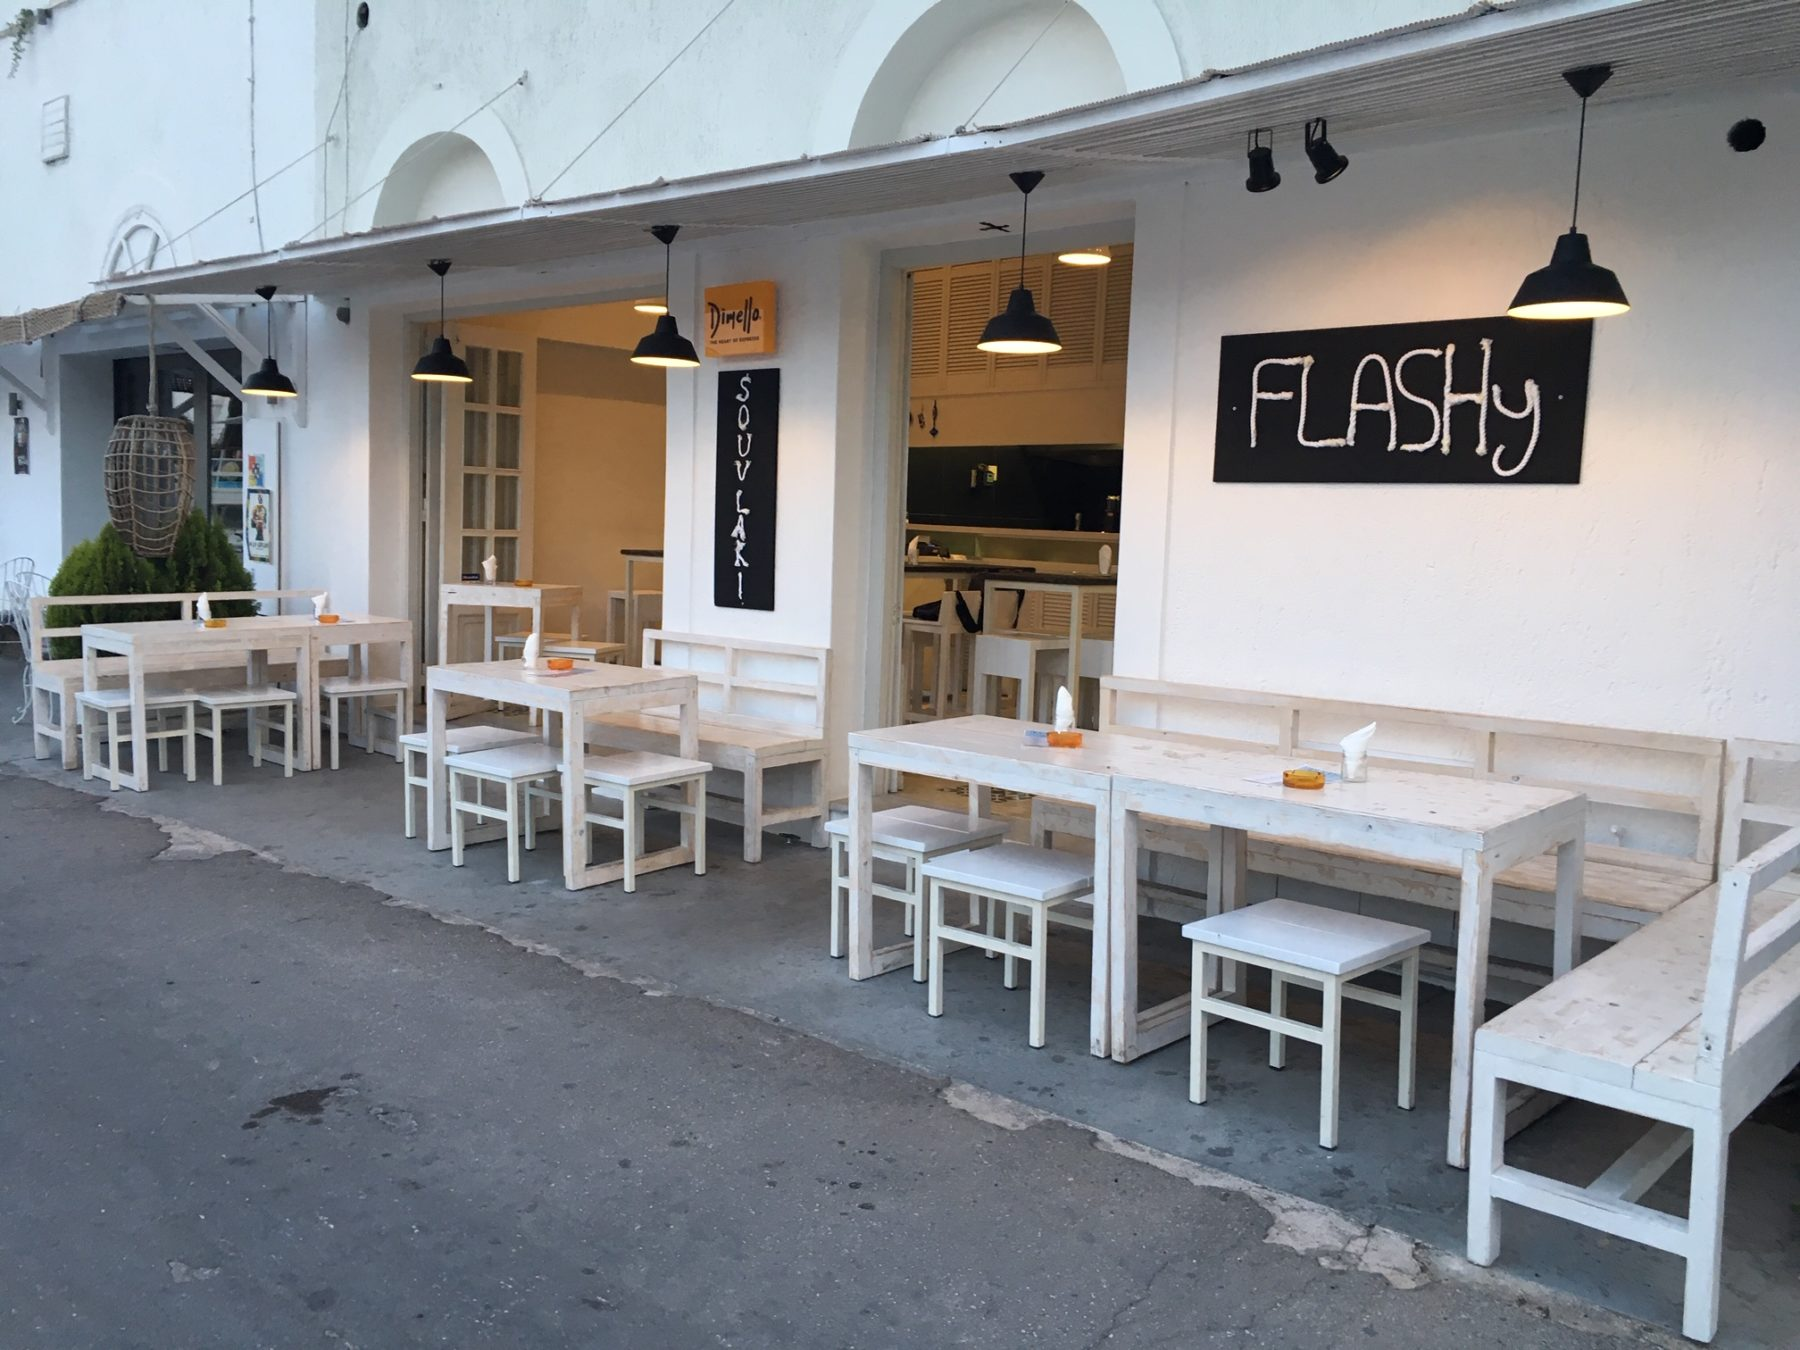 FLASHy Snack Bar – Grill House